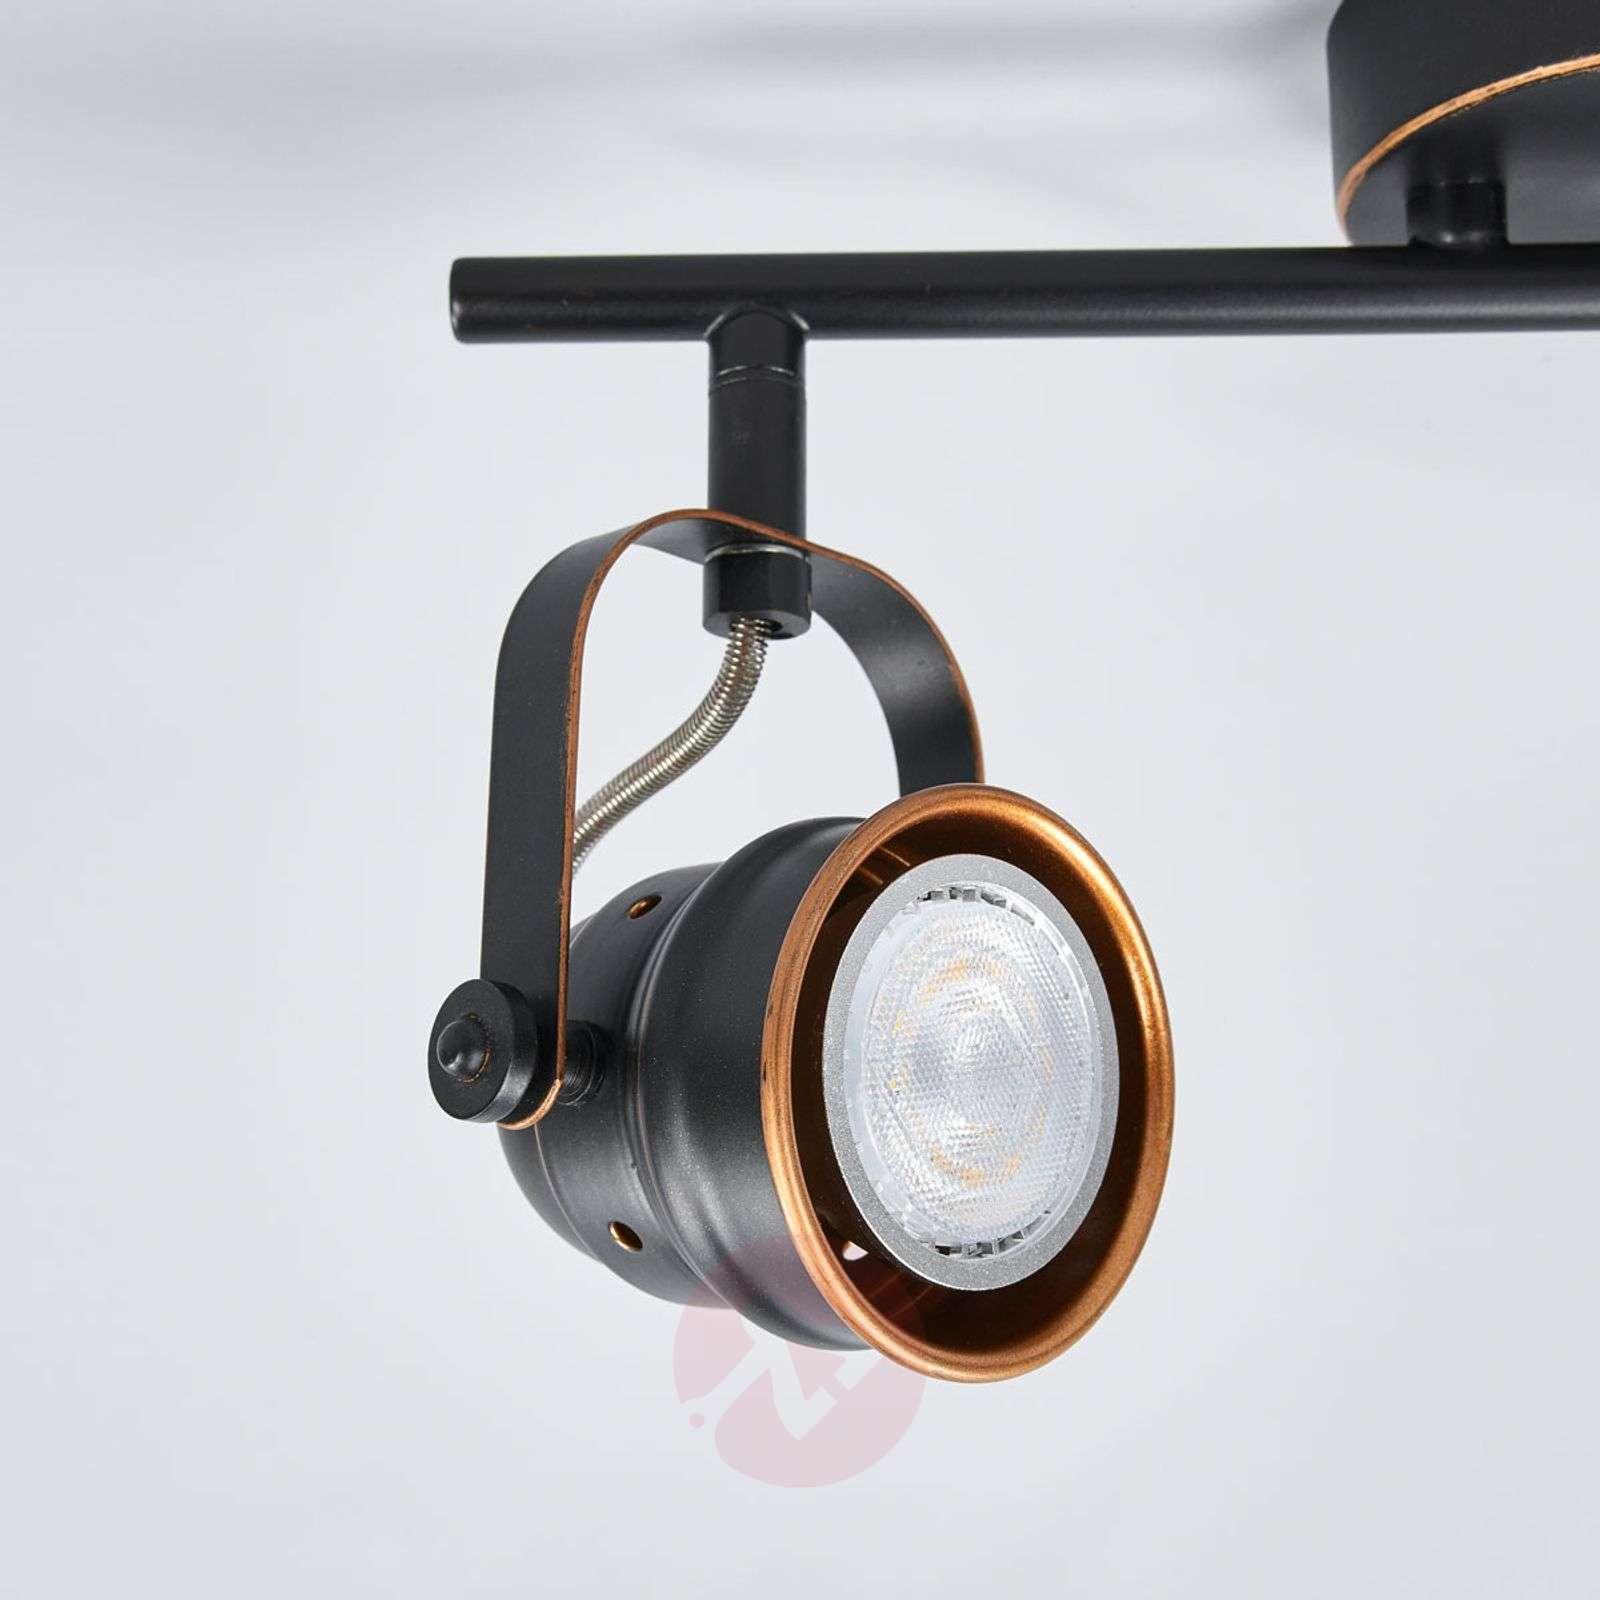 GU10 LED ceiling light Leonor, black and golden-9639067-01